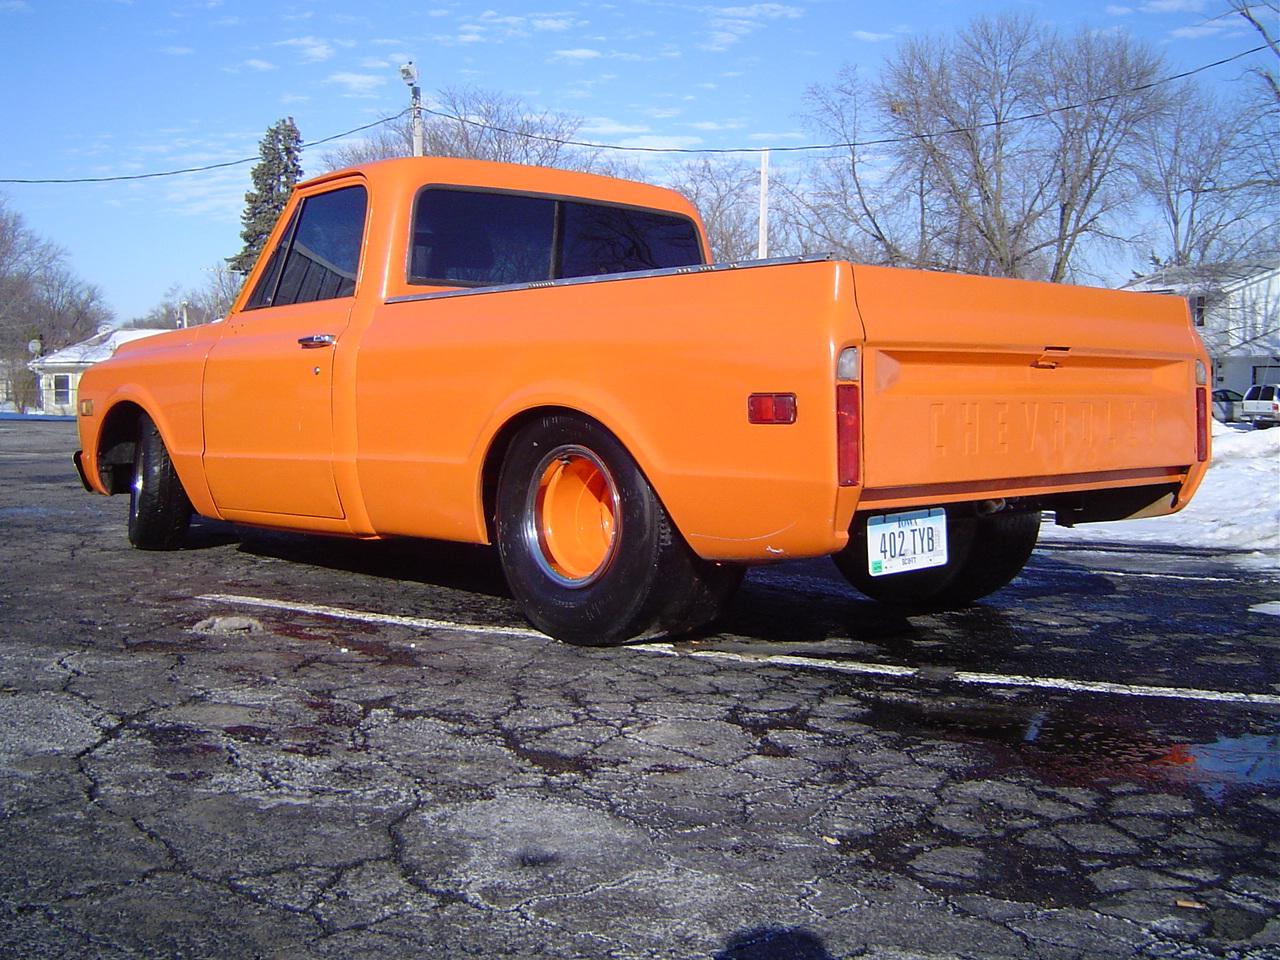 All Chevy c10 chevy : 1969 Chevy C10, Pro Street, 5.3, TH400 - Yates EFI